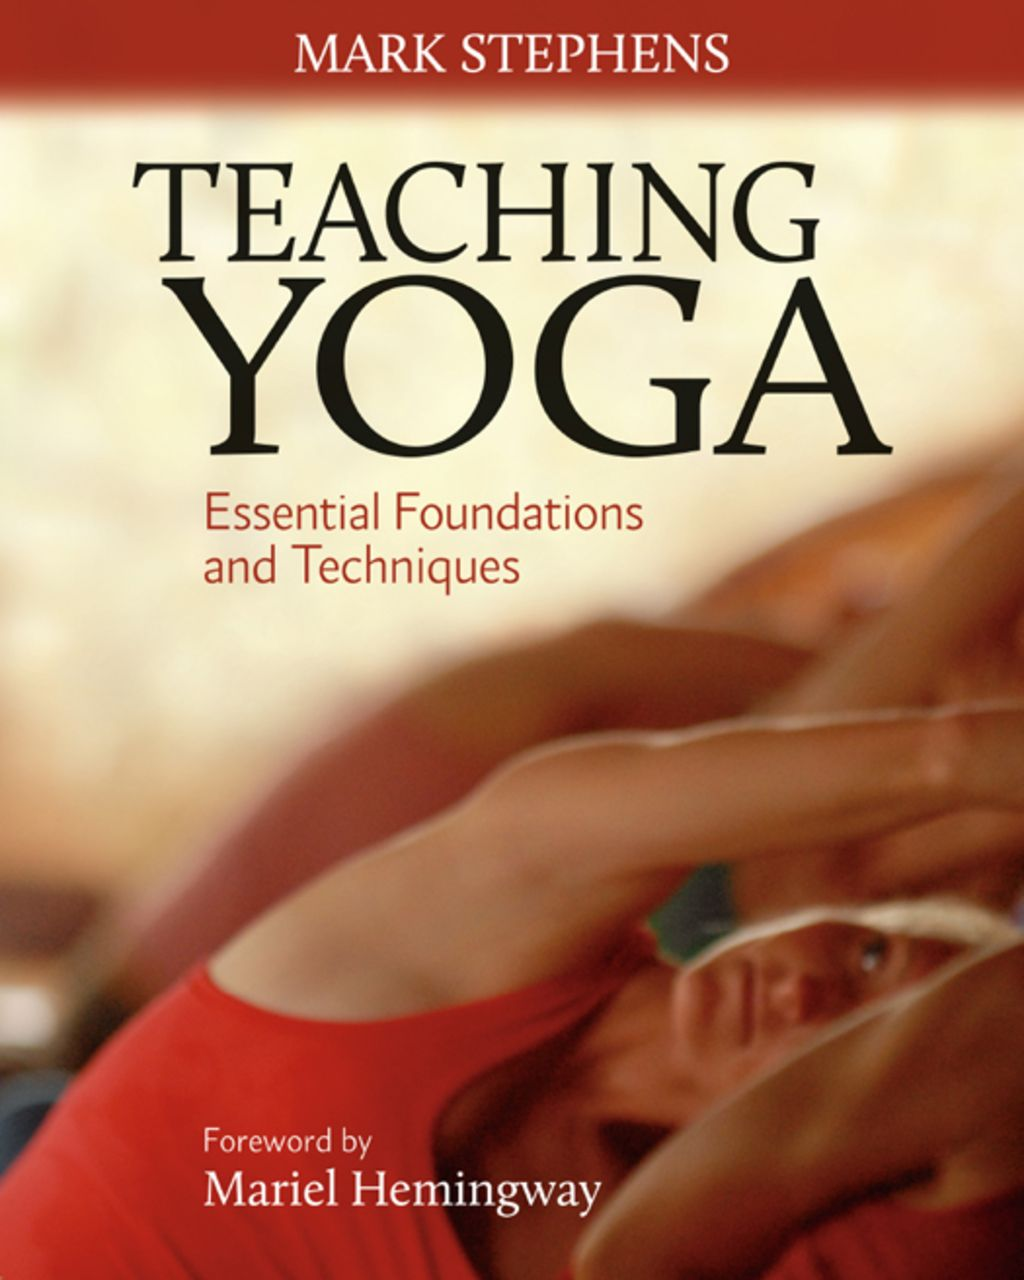 Teaching Yoga Ebook In